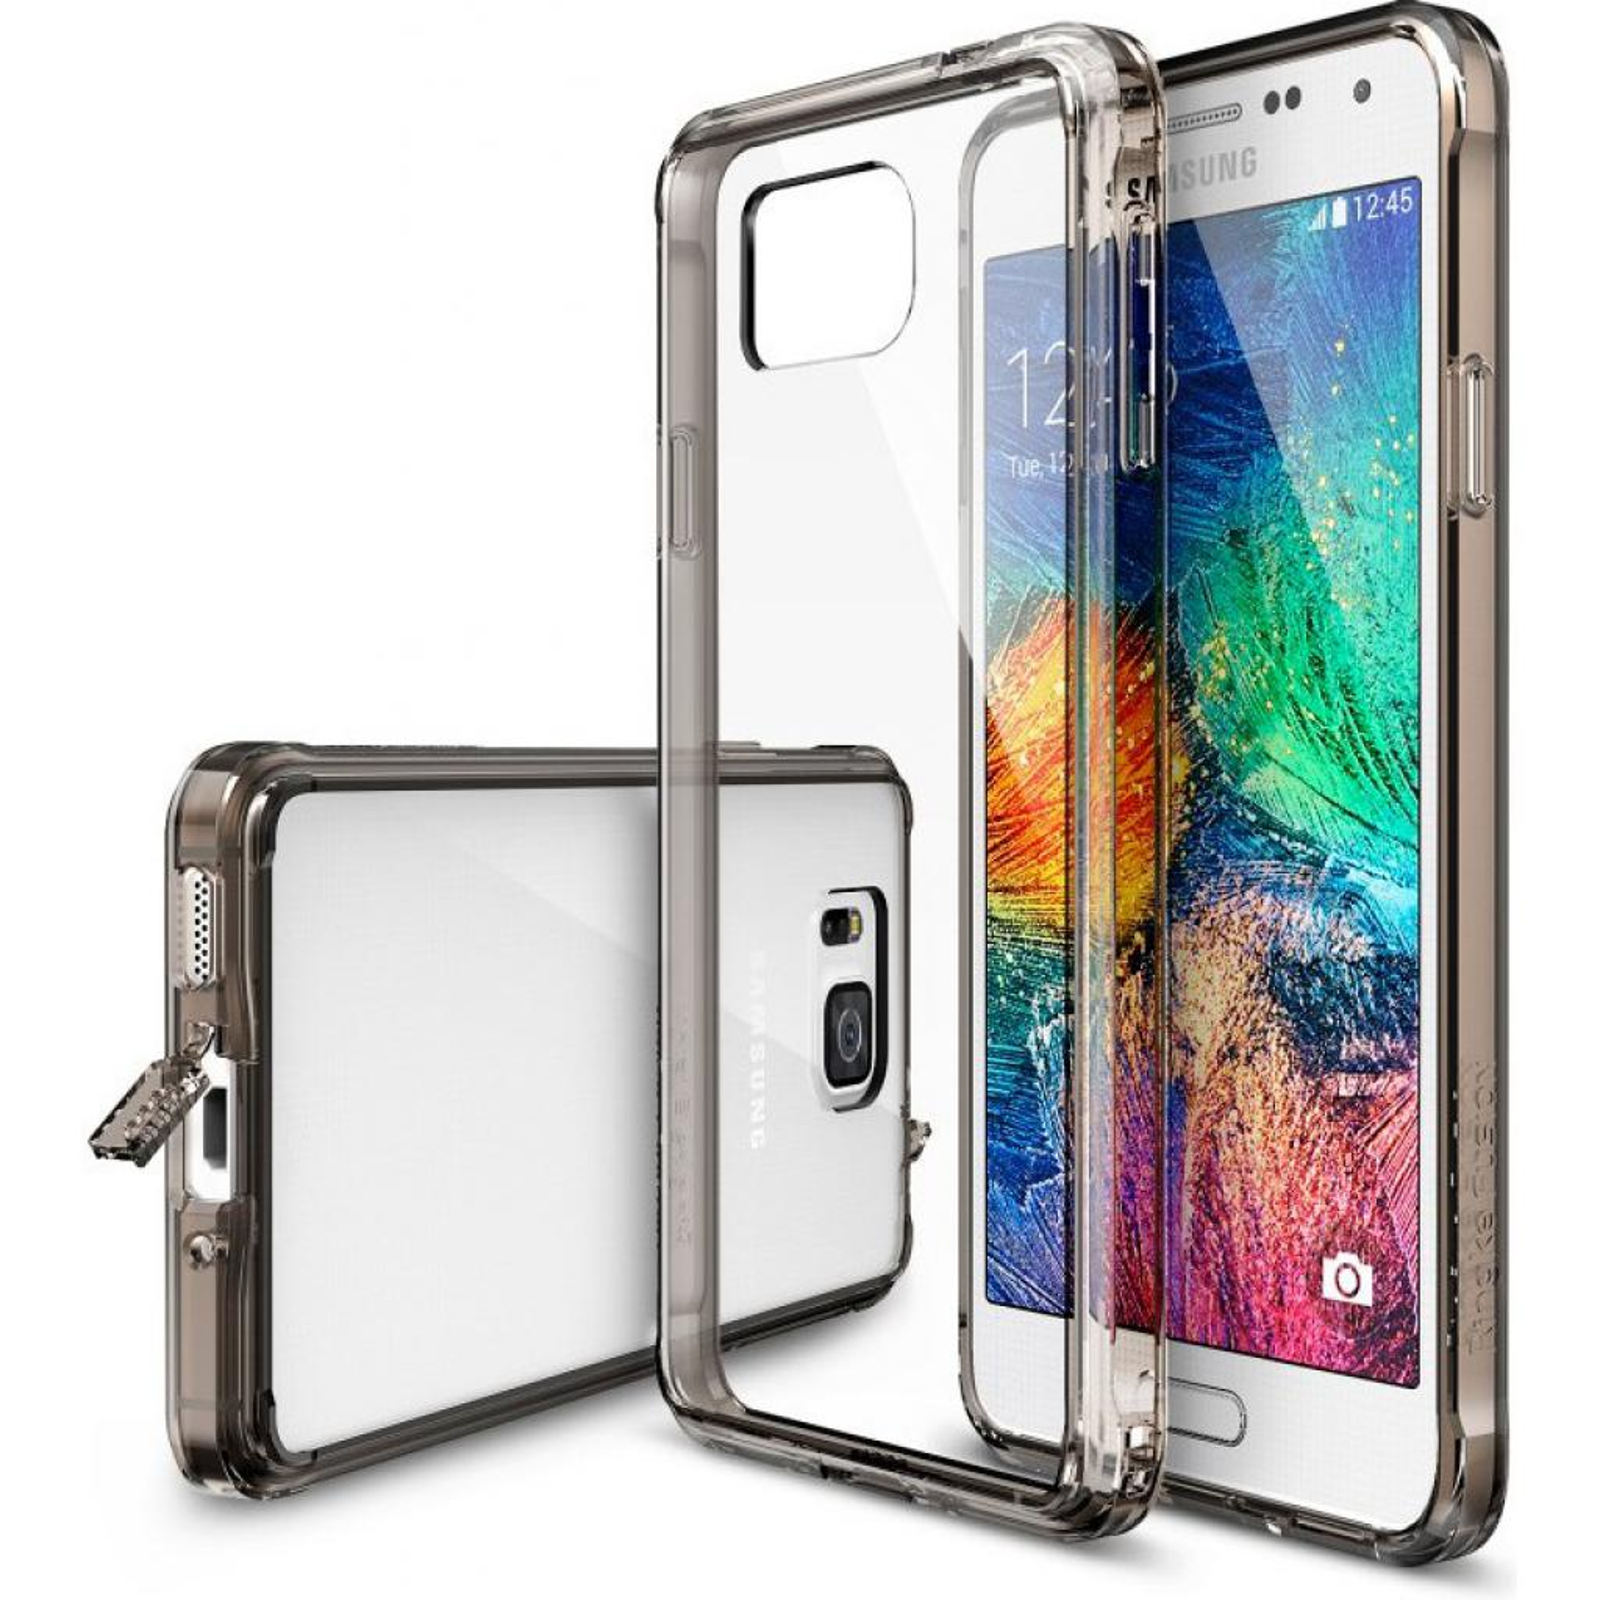 Чехол для моб. телефона Ringke Fusion для Samsung Galaxy Alpha (Smoke Black) (550654)